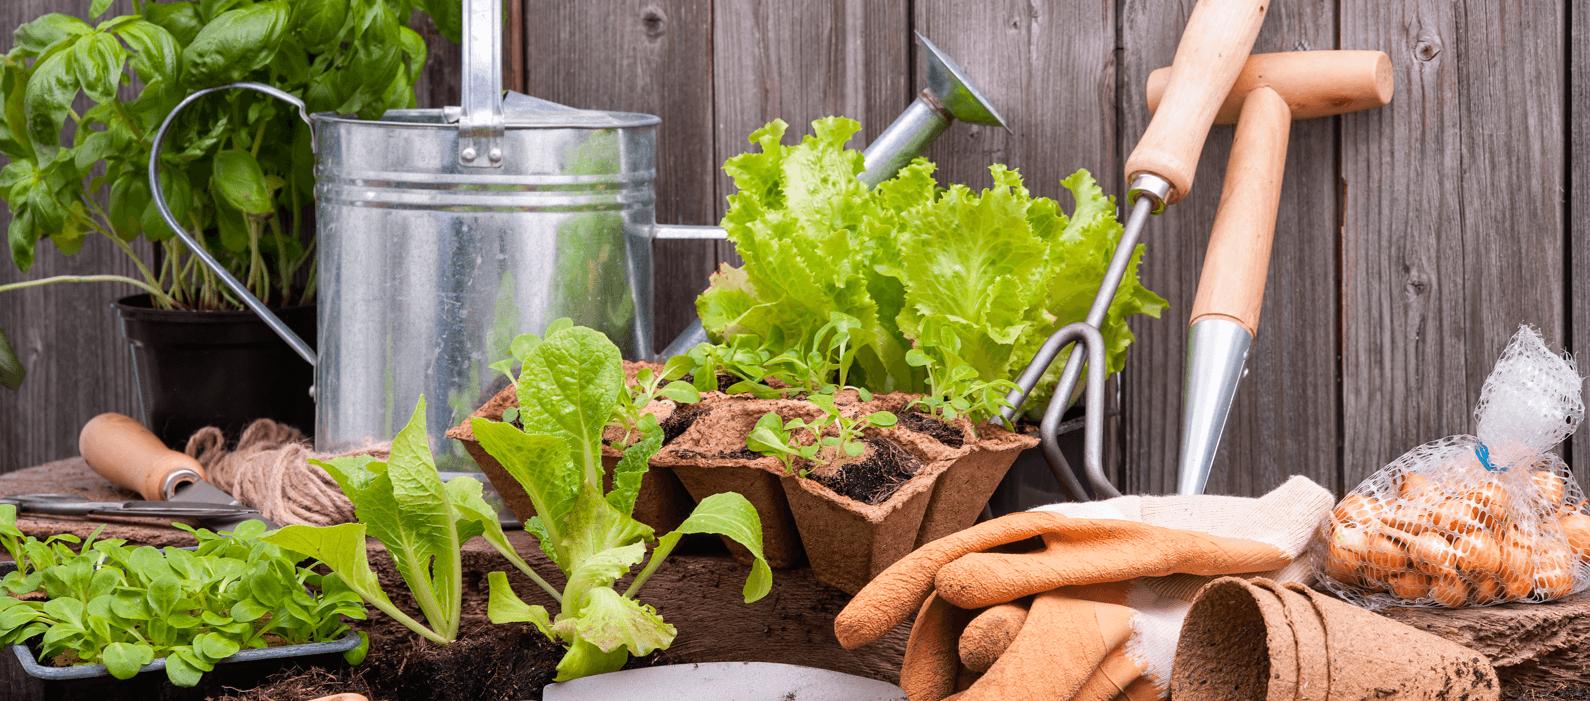 7 Gardening Tips that Work for Winnipeg Featured Image